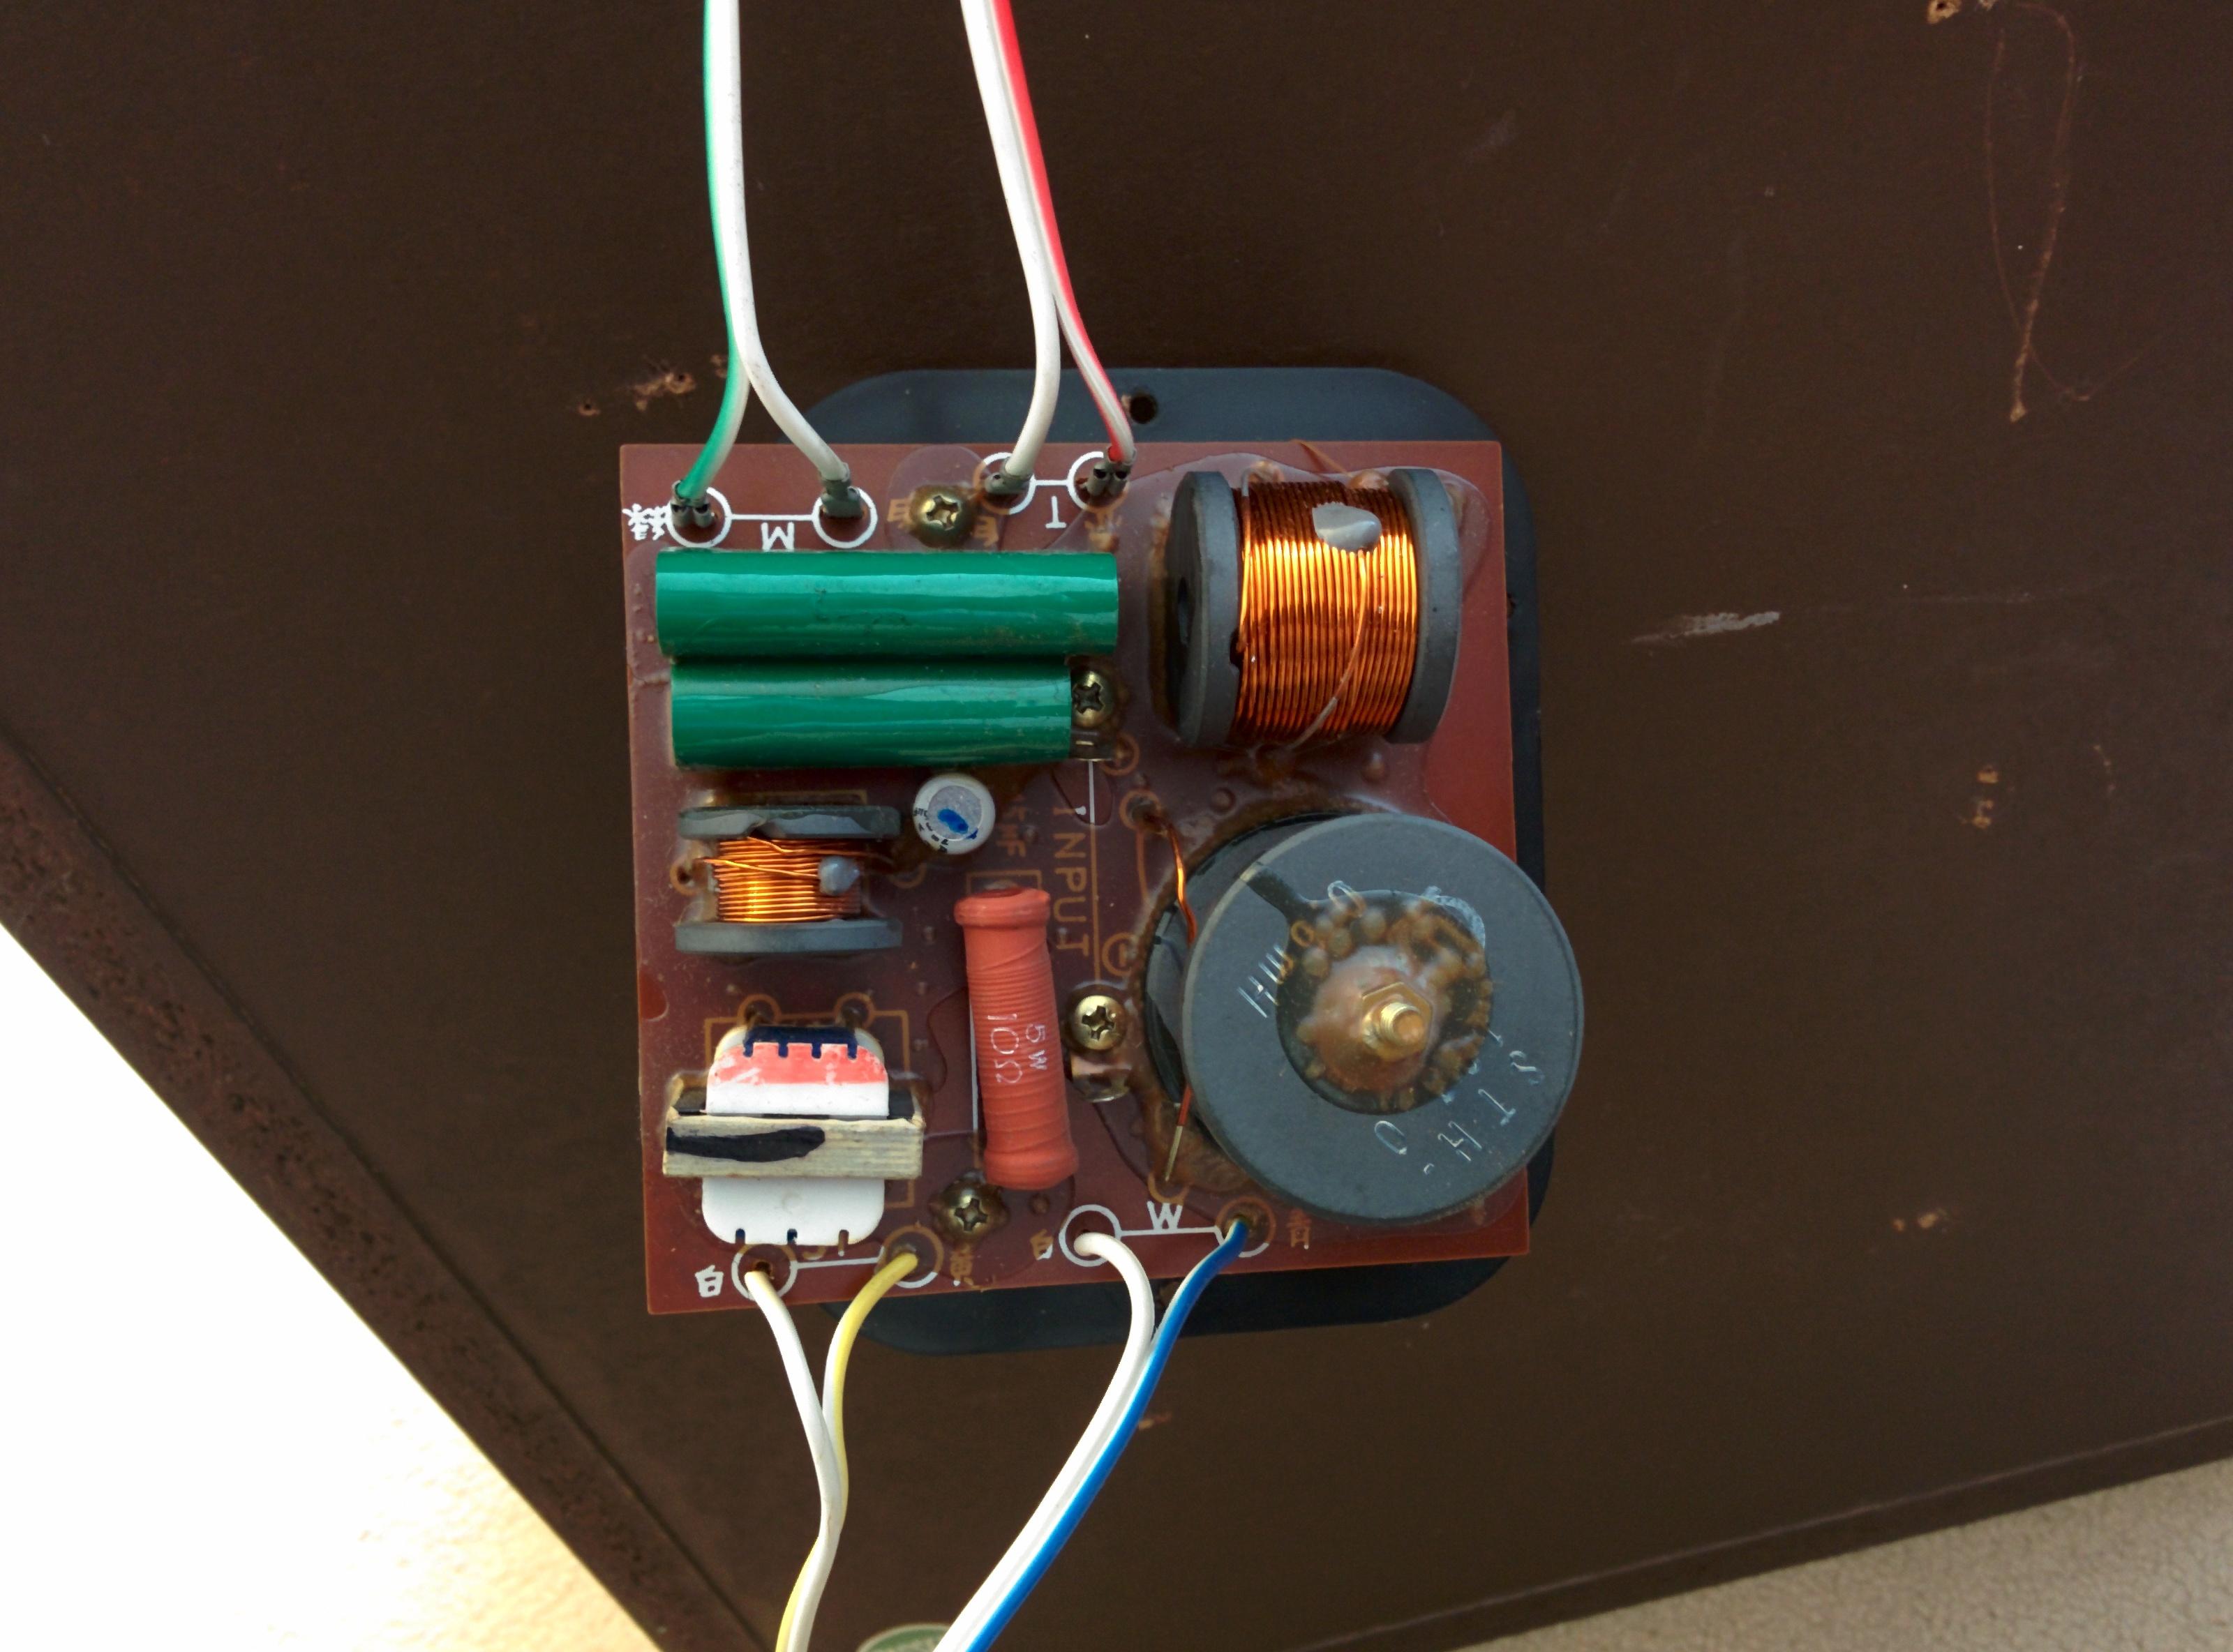 capacitor wiring diagram for 3 way light switch three pioneer hpm-100 loudspeakers restoration | audiophile vintage